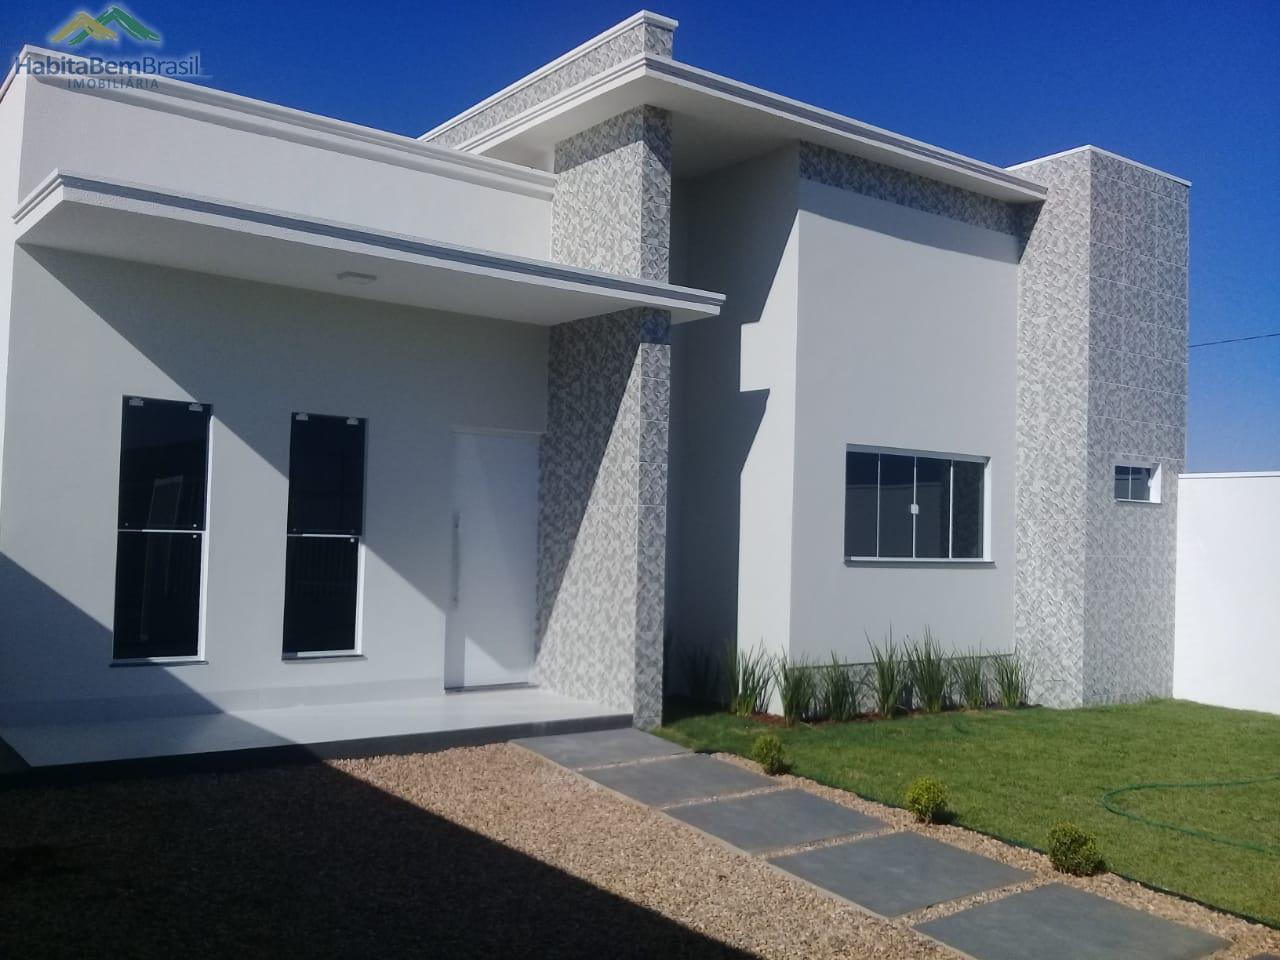 Casa com 3 dormitórios à venda, JARDIM RIVA, PRIMAVERA DO LESTE - MT